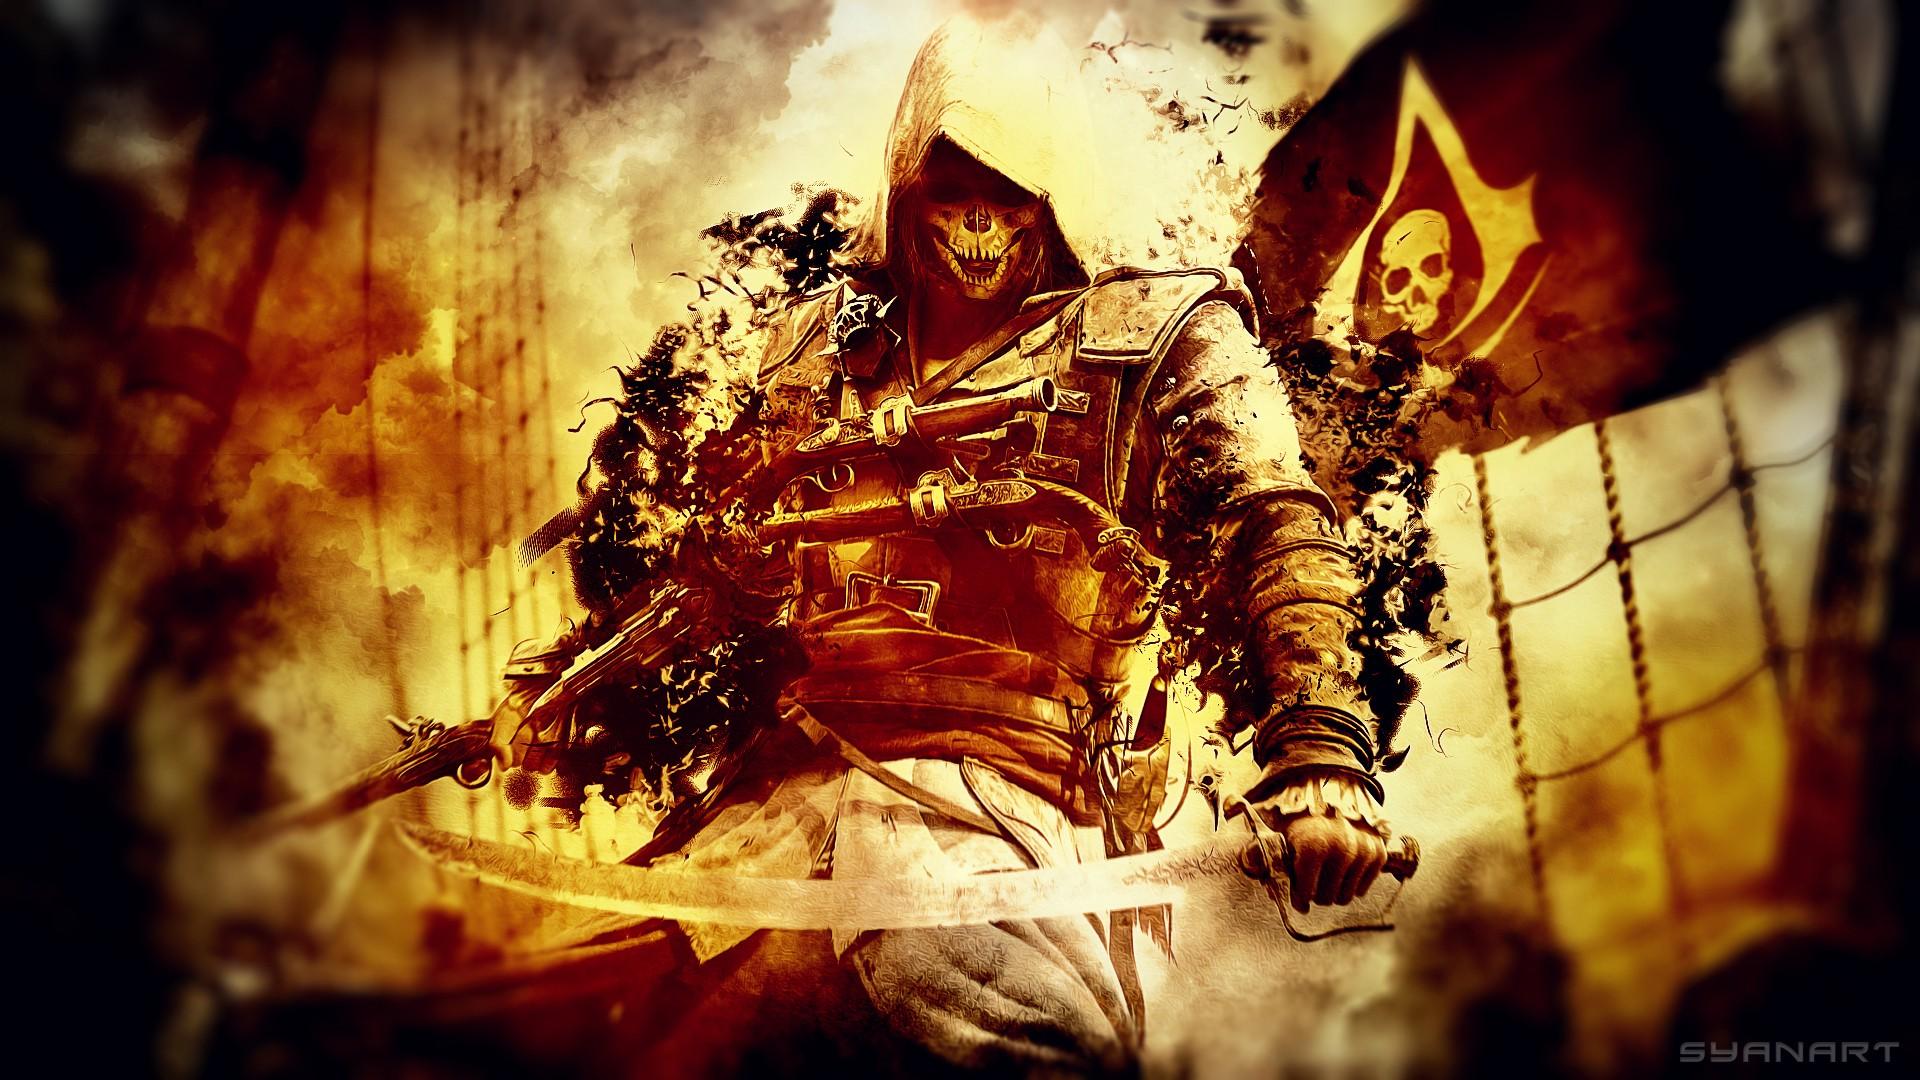 Assassins Creed Black Flag Pirate Sword Skull Wallpaper